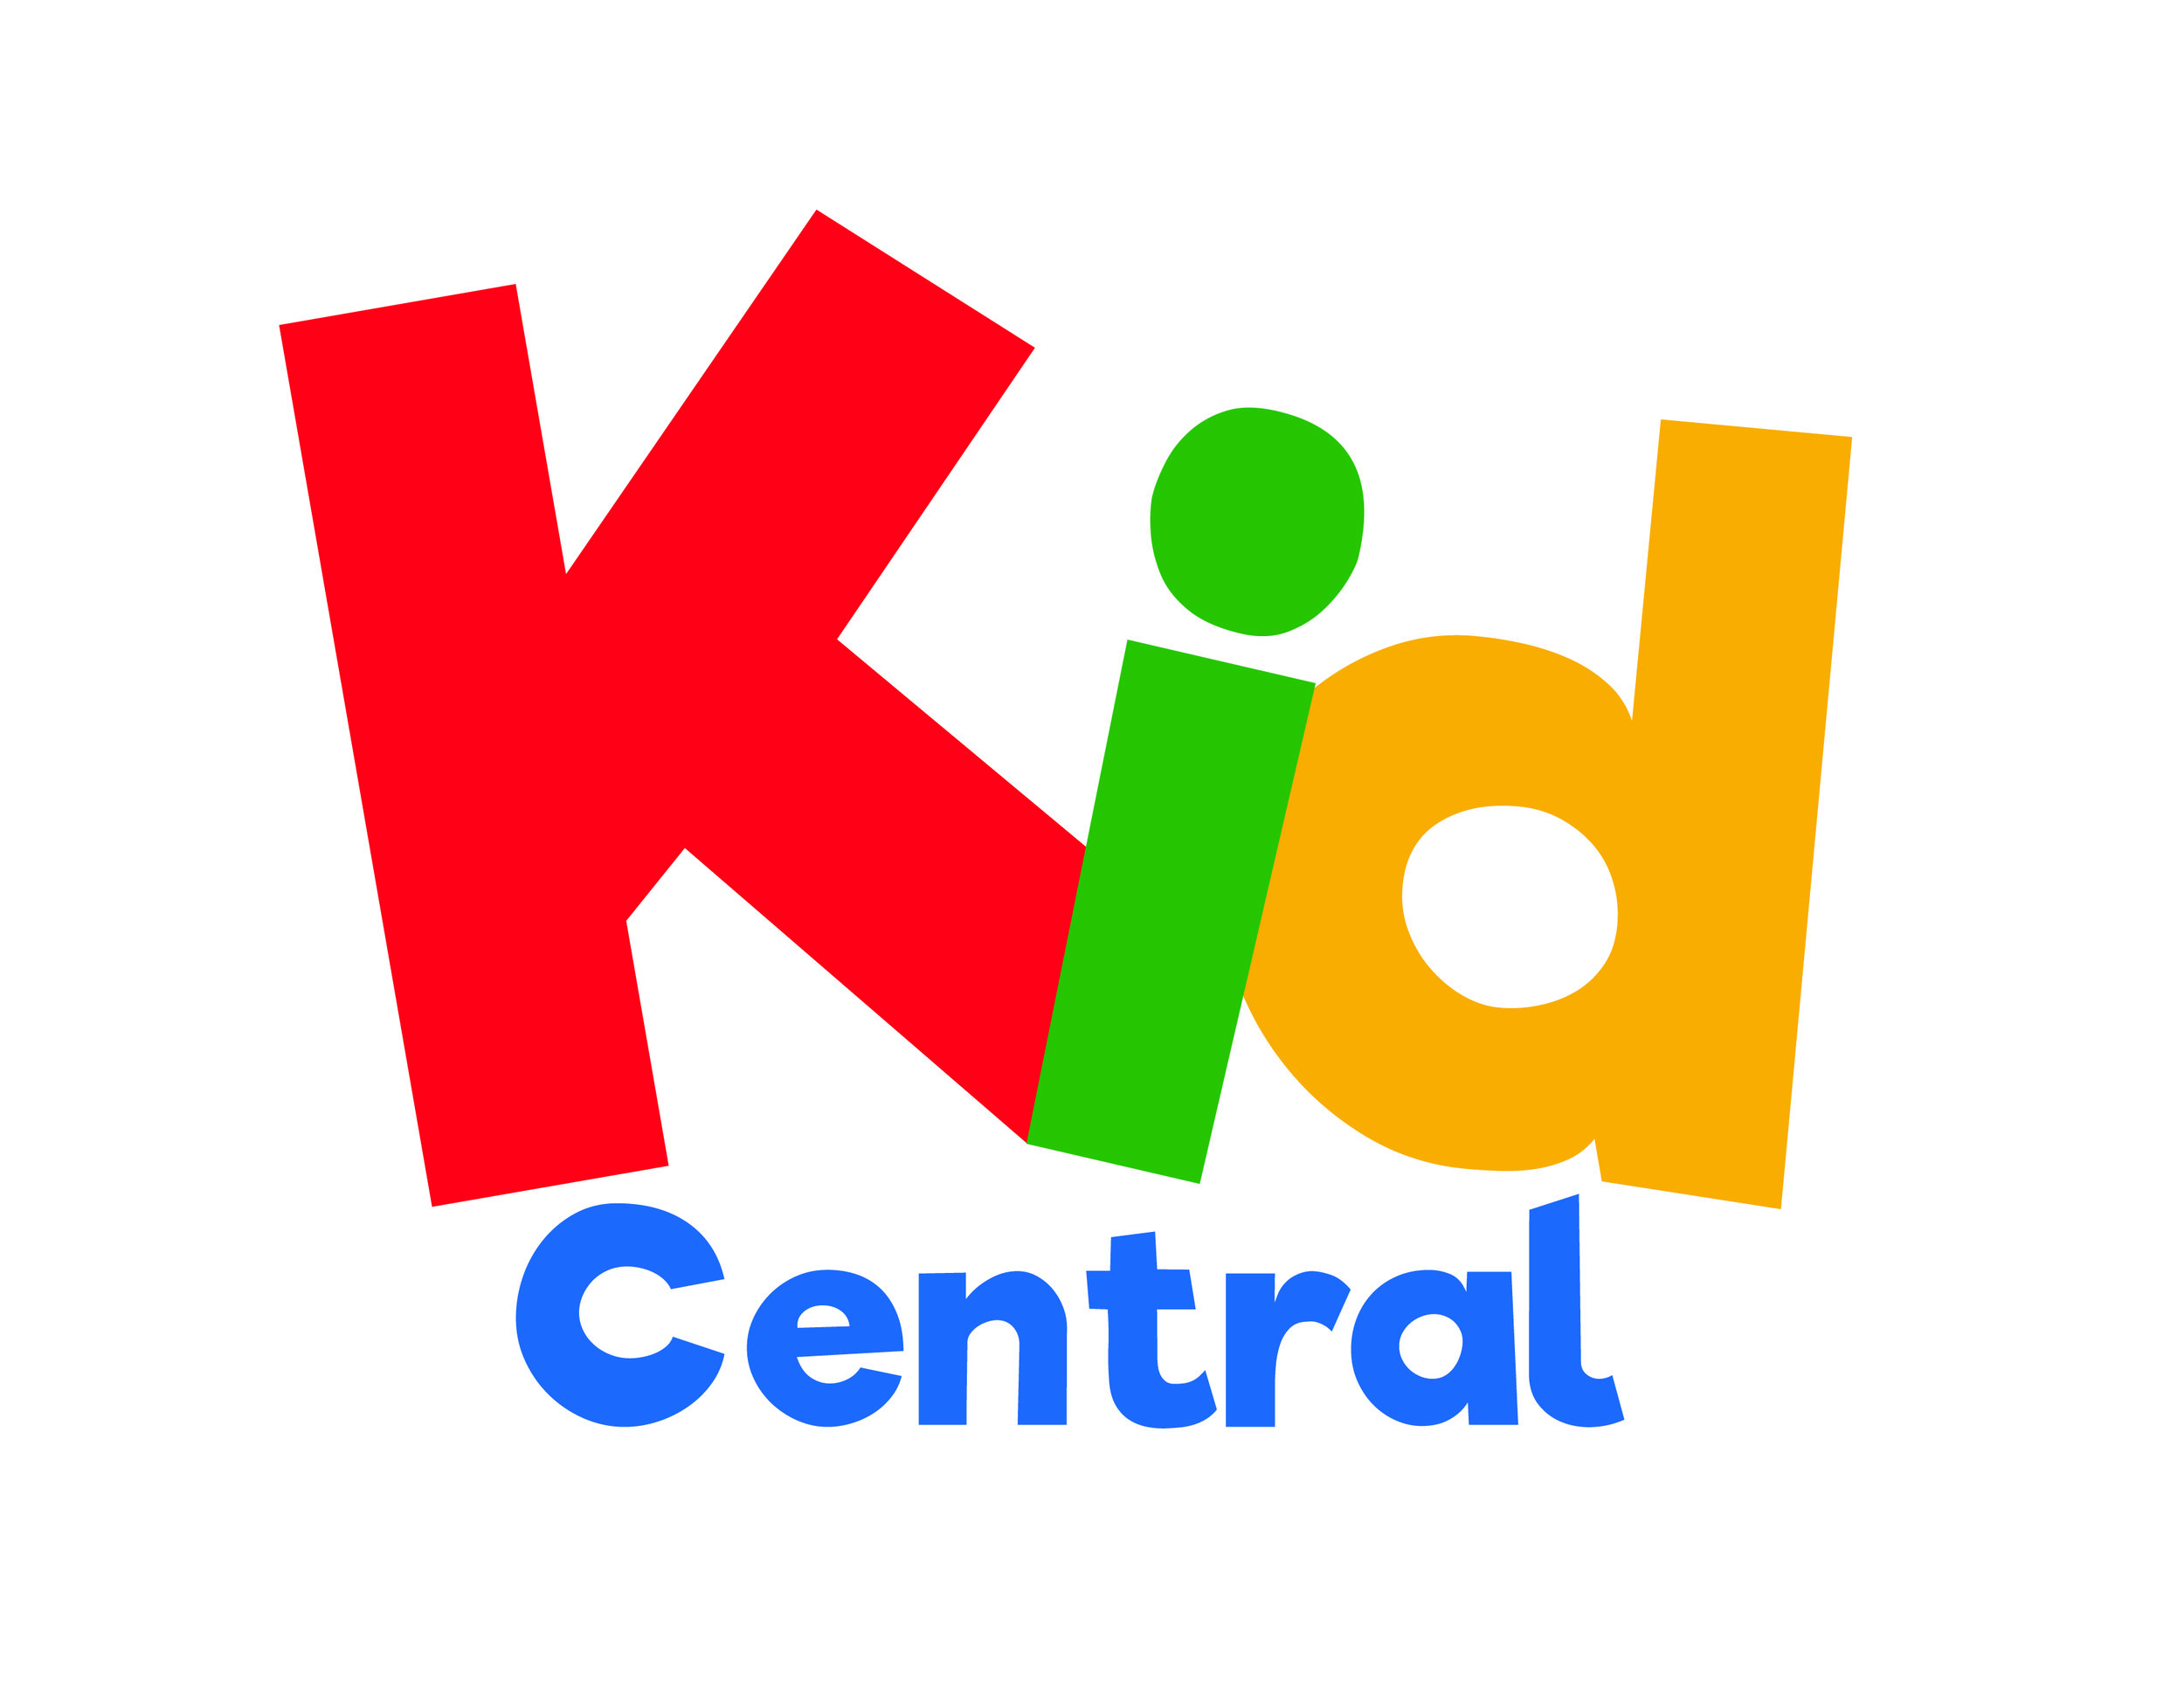 kid_central_logo.jpg